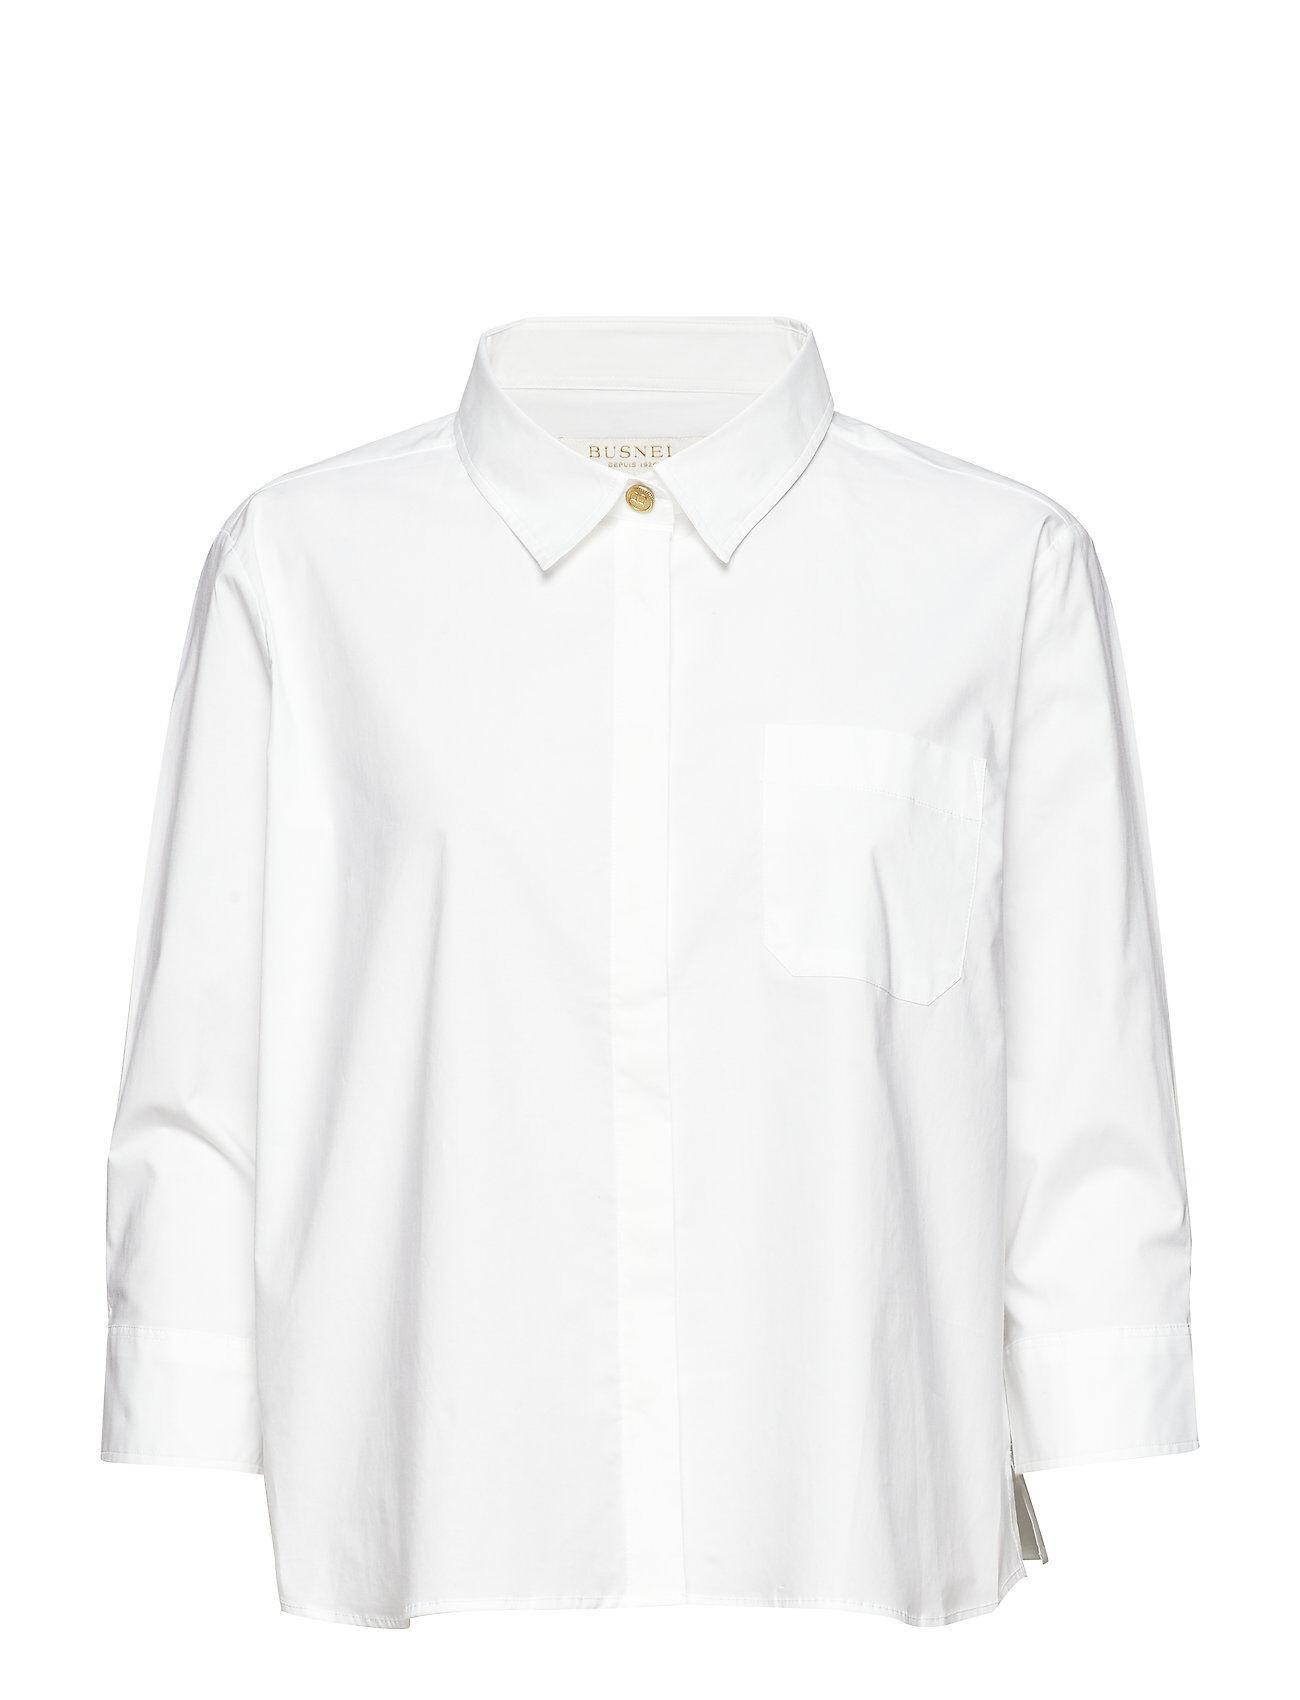 BUSNEL LanouéE Shirt